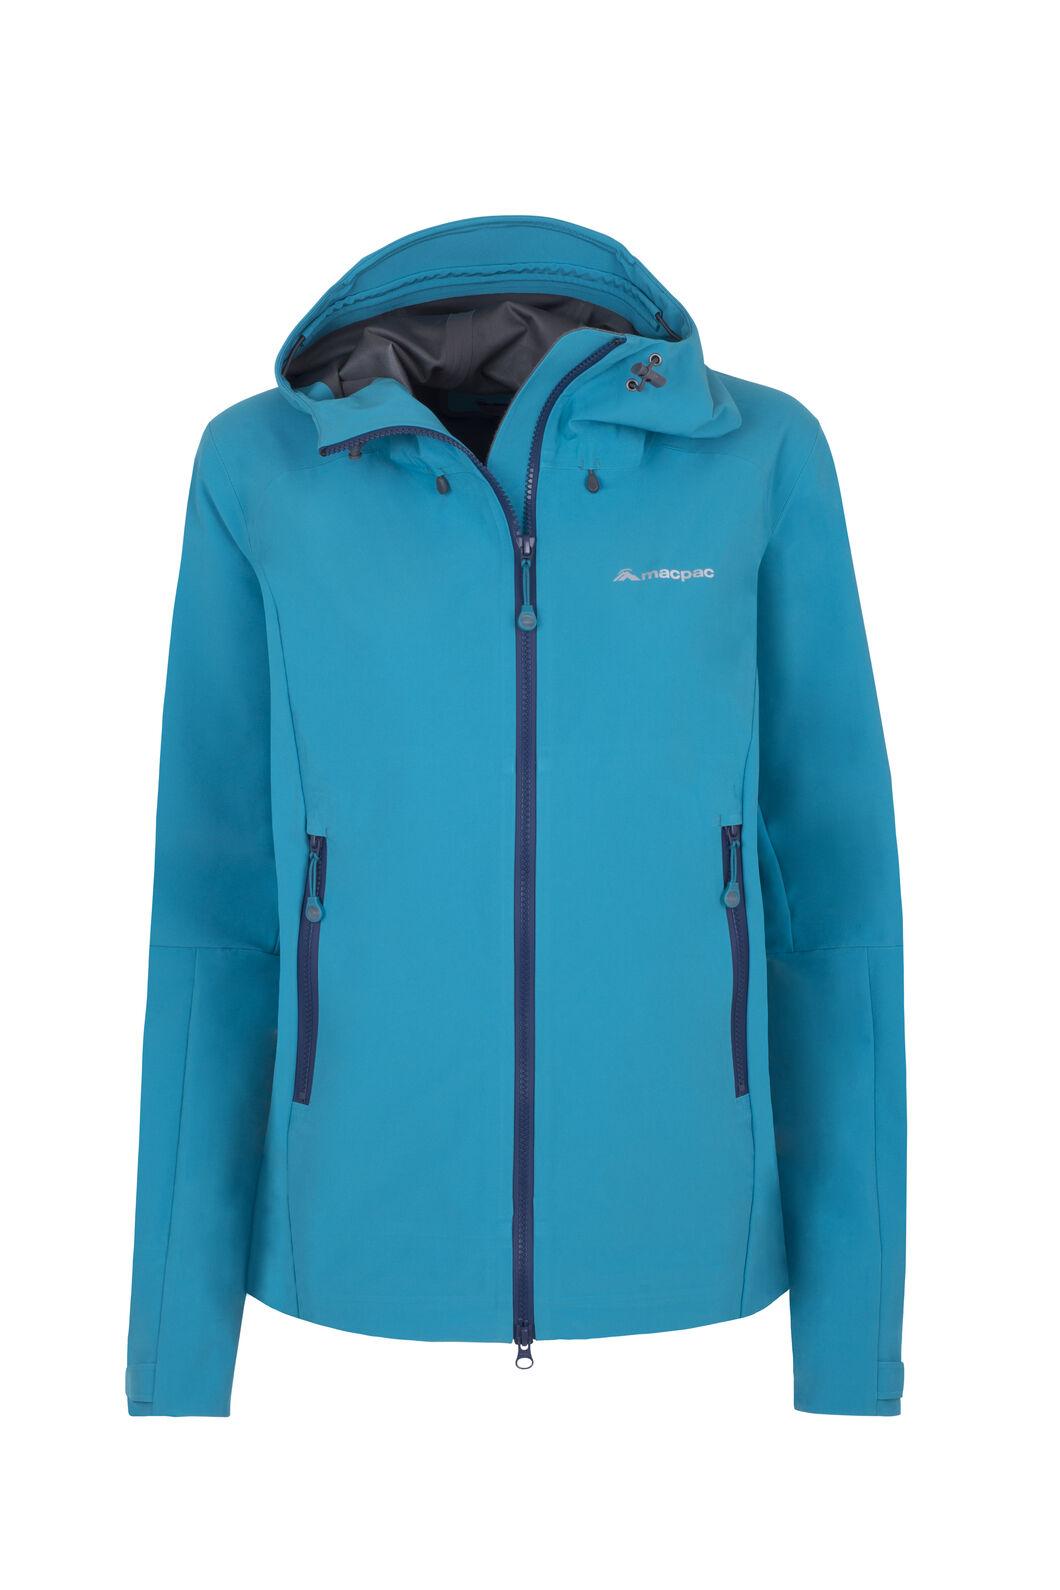 Macpac Fitzroy Alpine Series Softshell Jacket - Women's, Enamel, hi-res